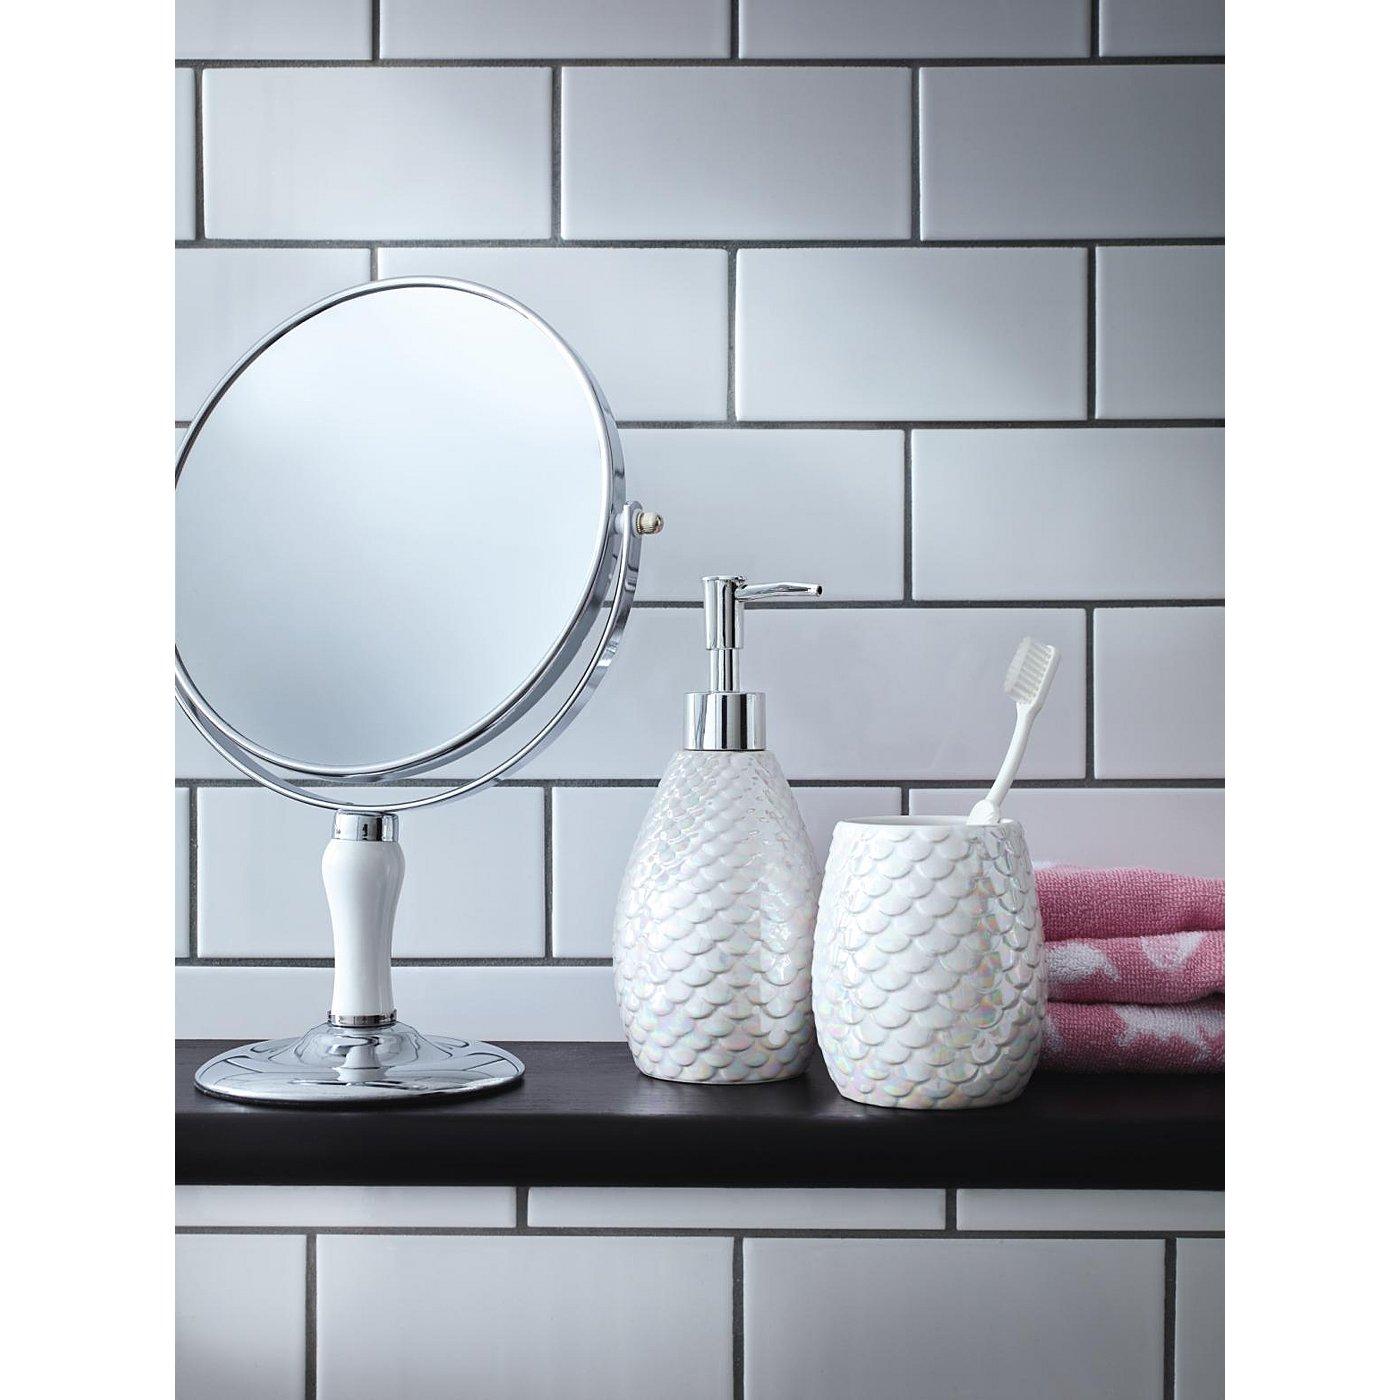 The best 100 metallic bathroom accessories image for Best bathtub accessories